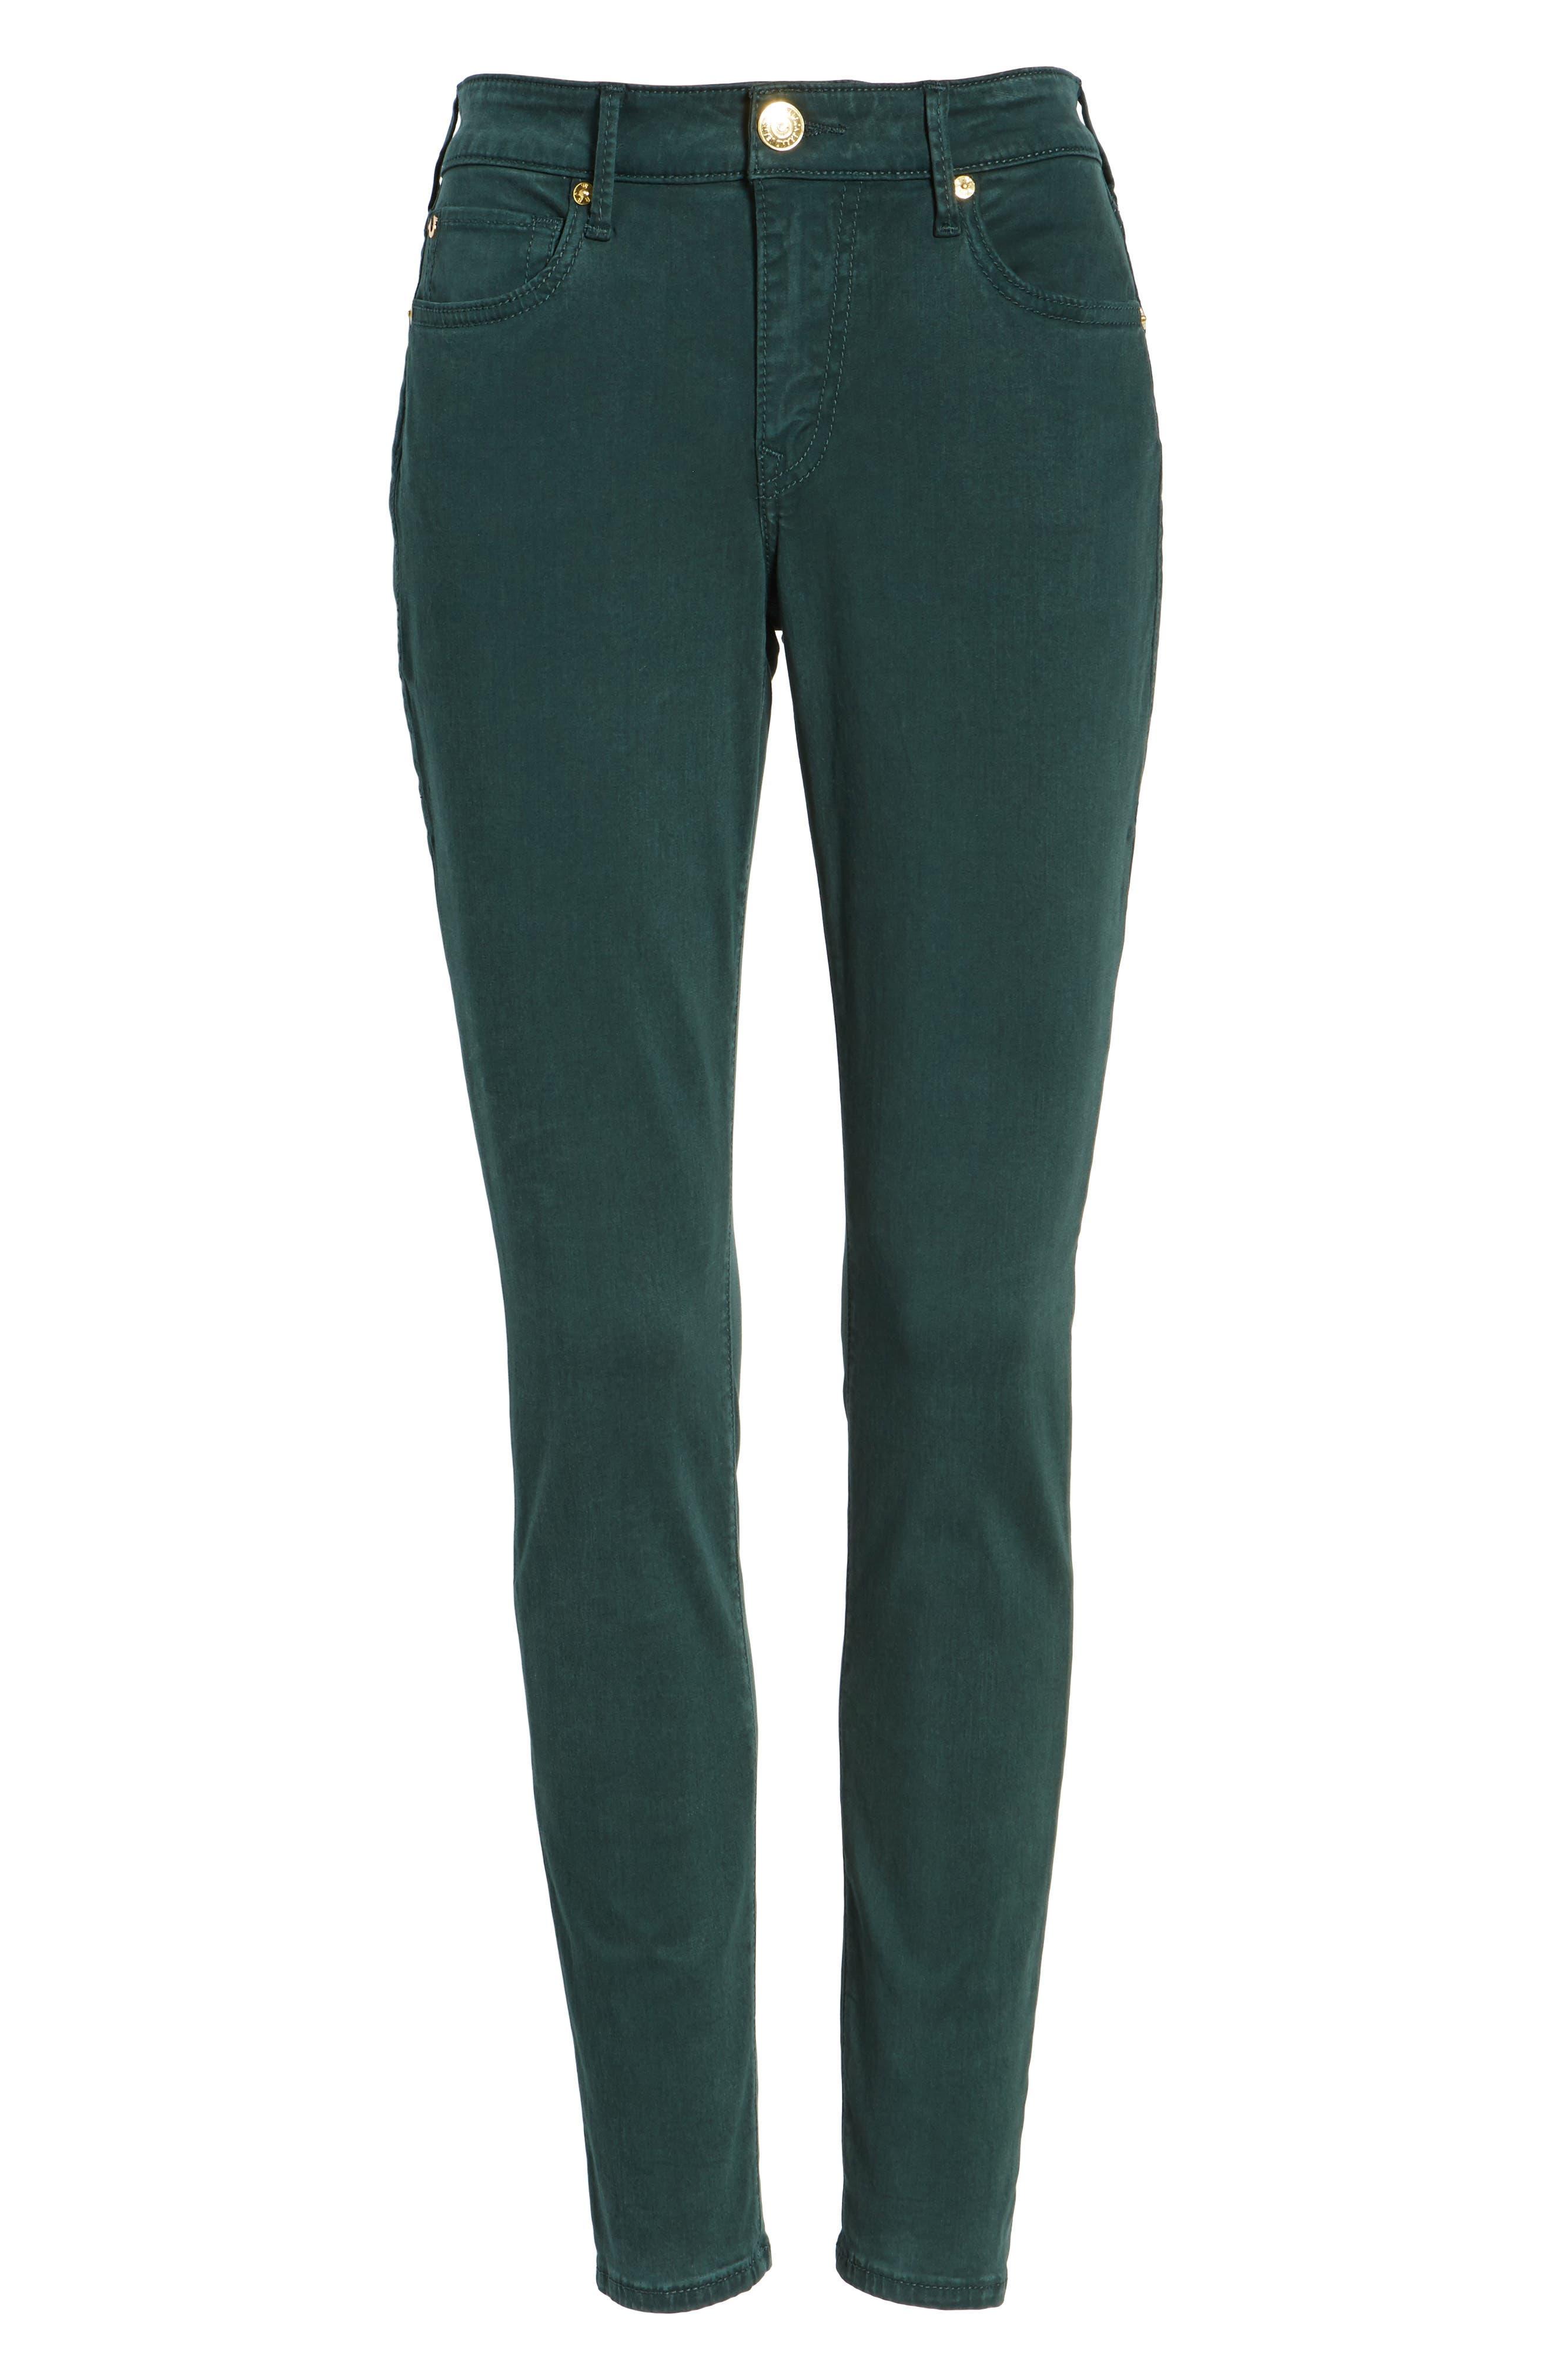 Jennie Curvy Skinny Jeans,                             Alternate thumbnail 7, color,                             Hunter Green